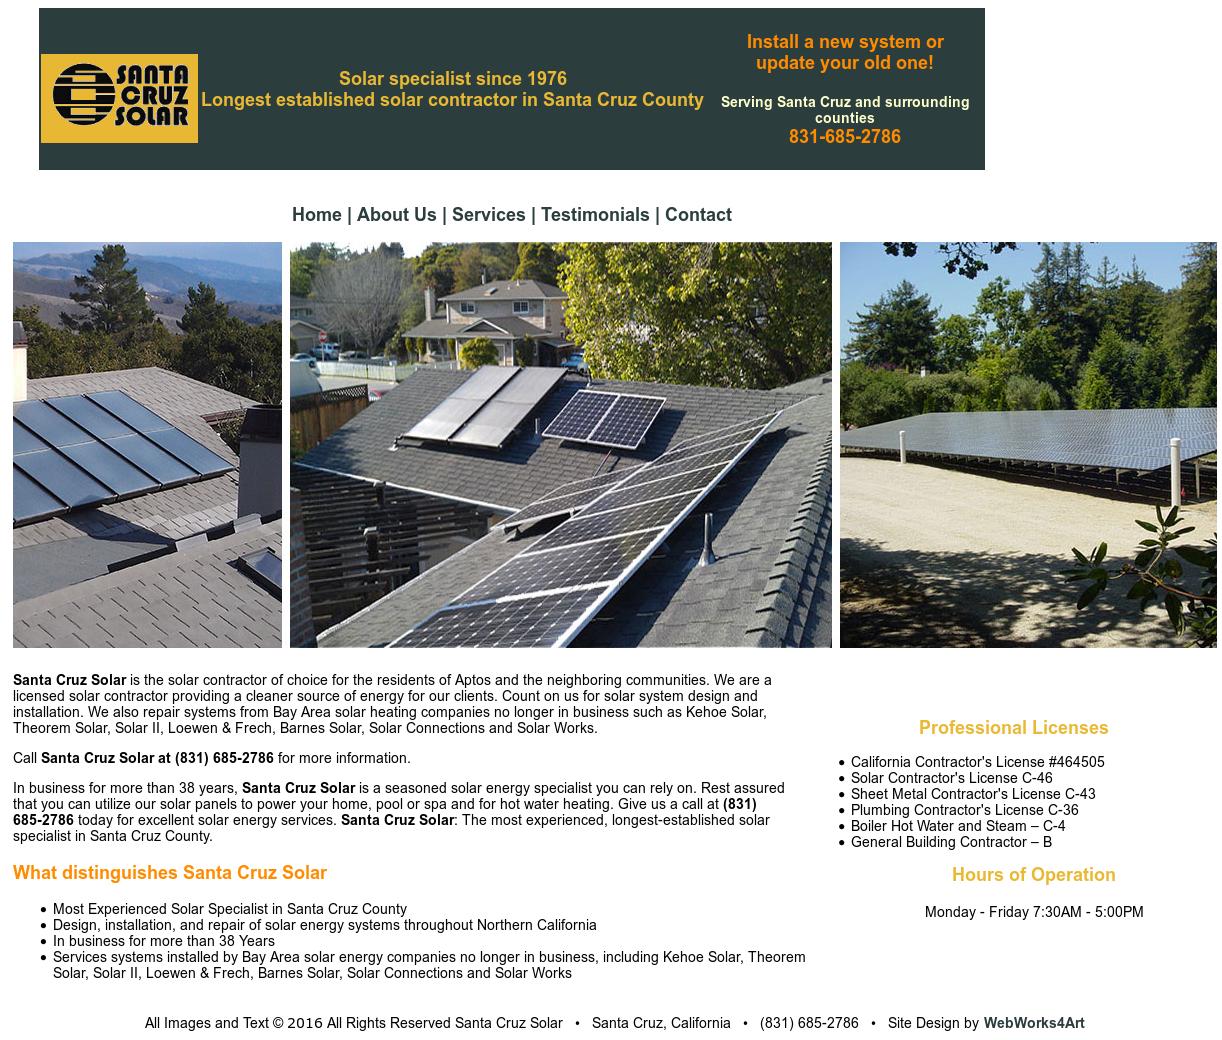 Santa Cruz Solar Competitors, Revenue and Employees - Owler